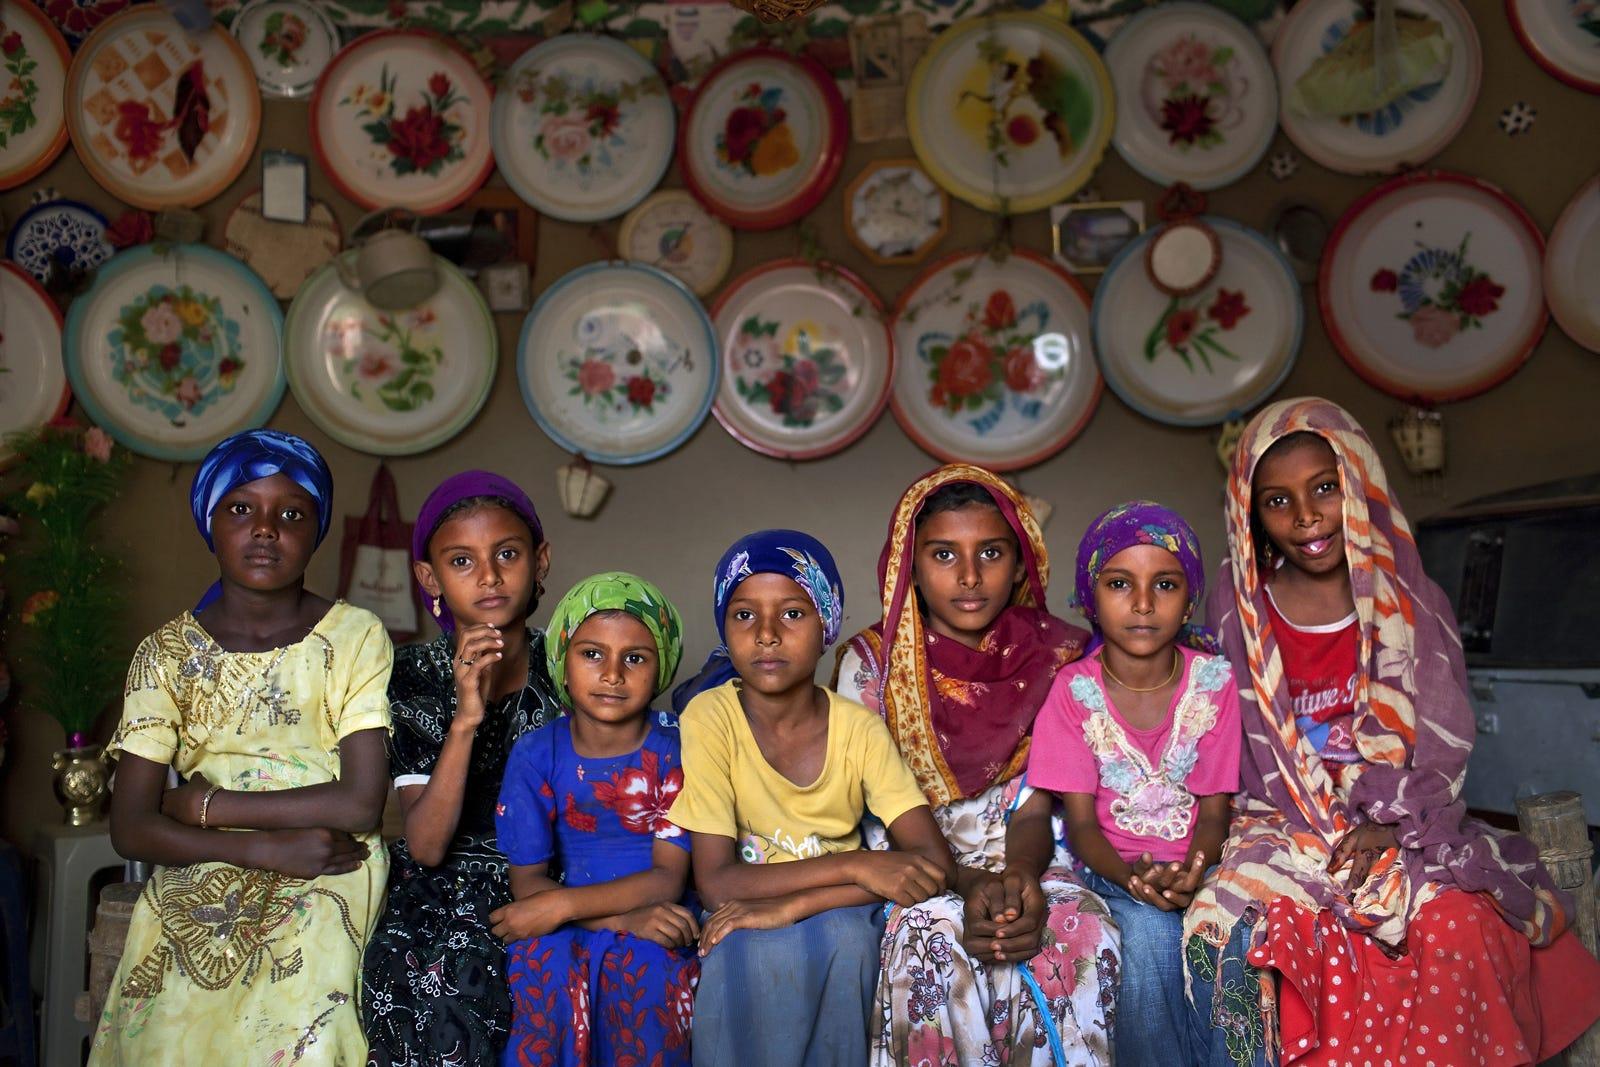 Child Marriage Around The World In Photos